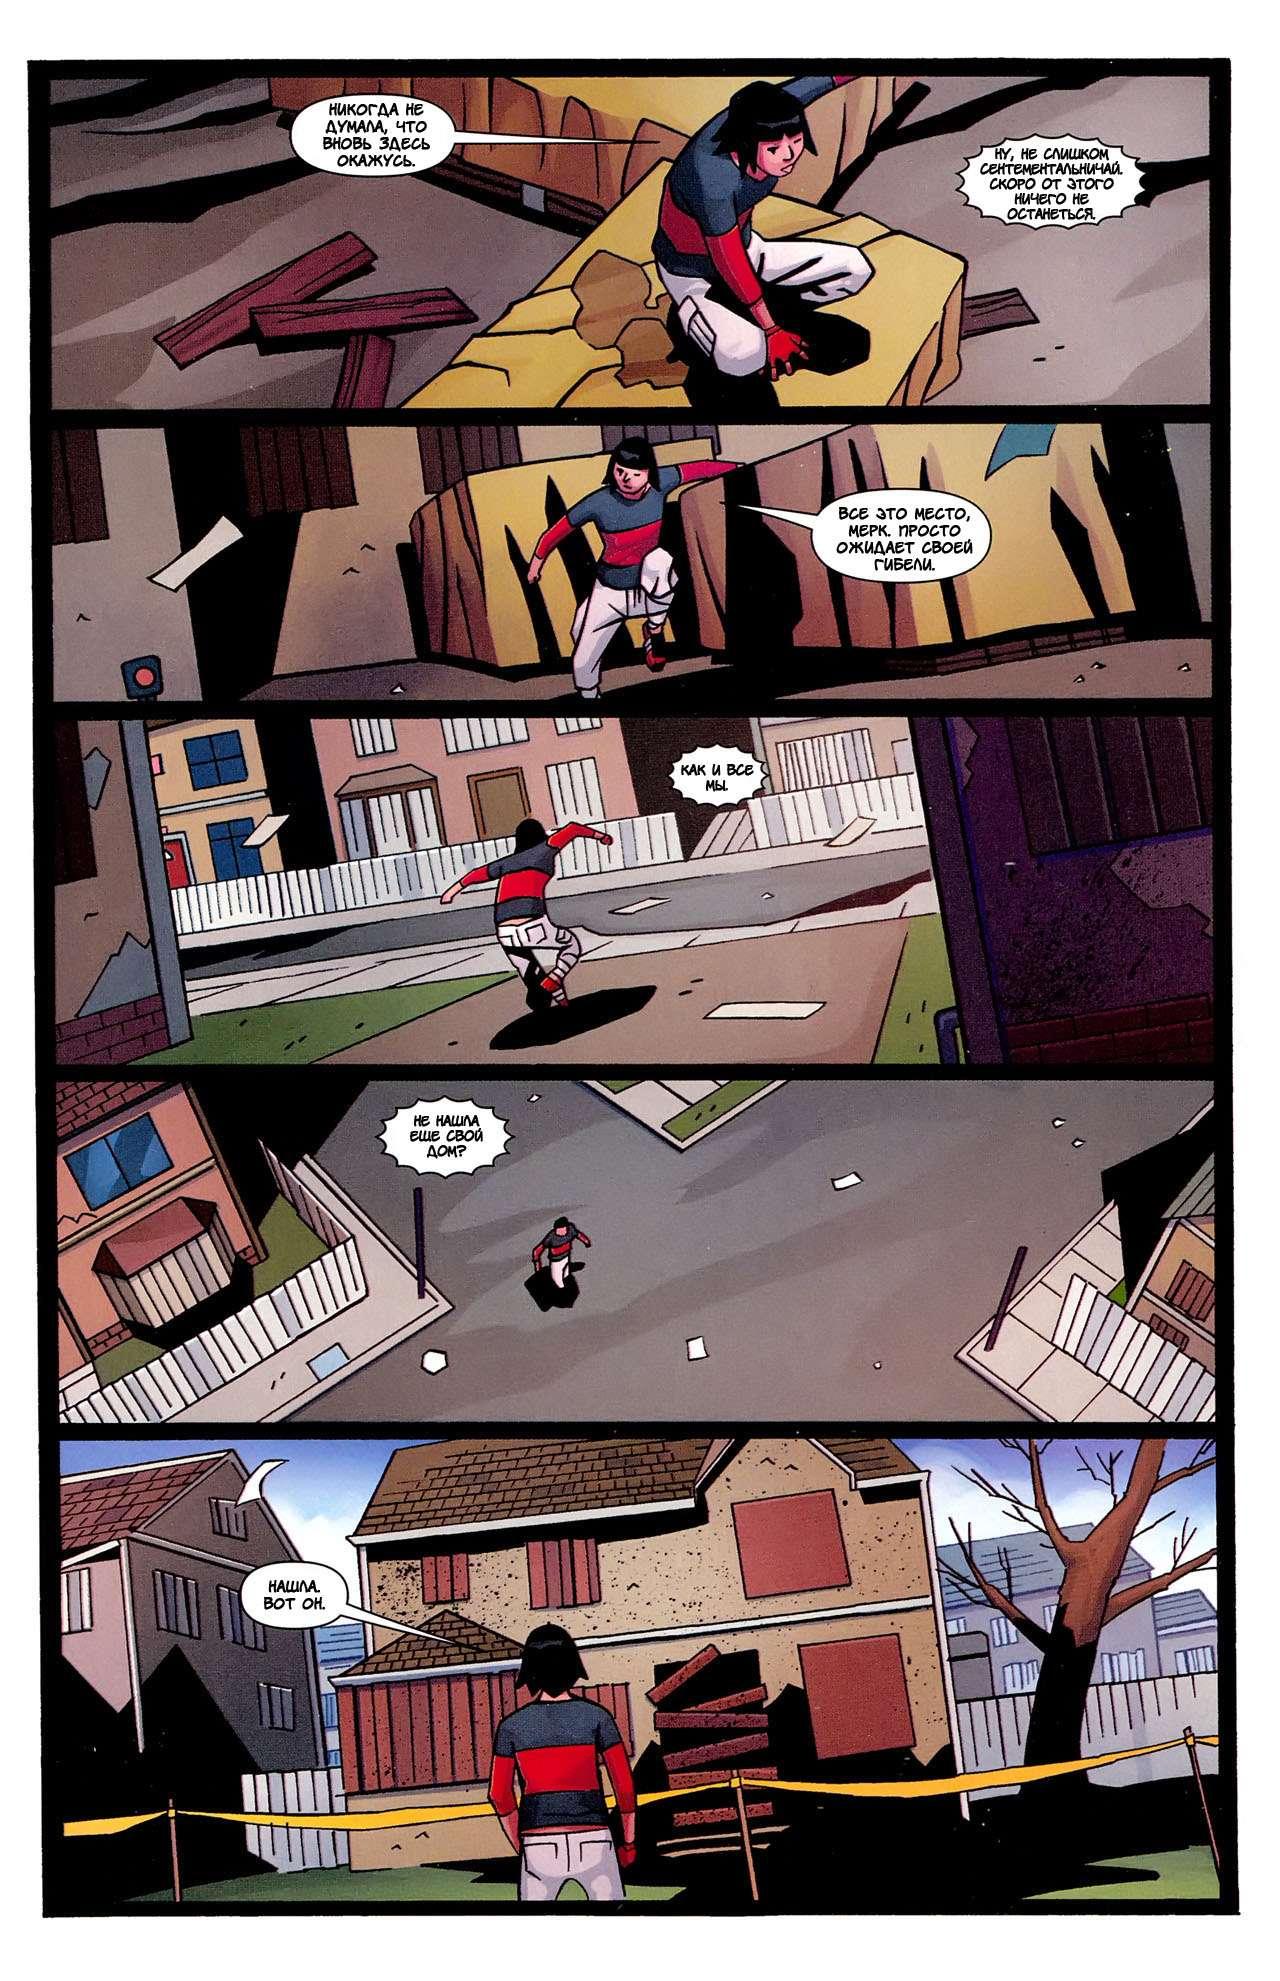 mirrors-edge-05-pg-26